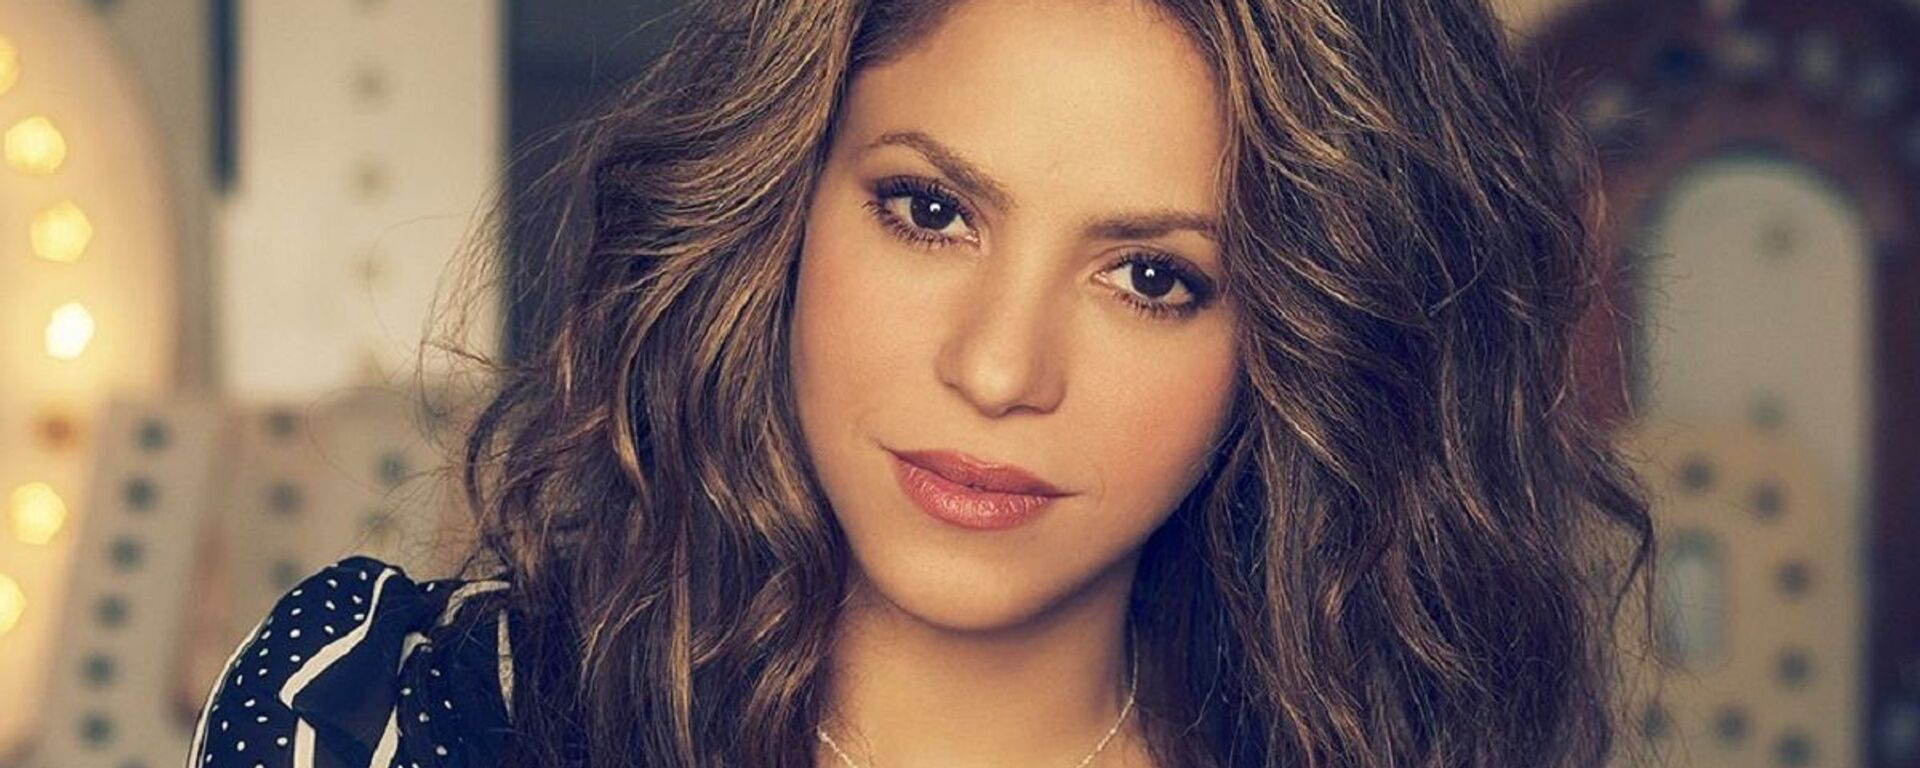 Shakira, cantante colombiana - Sputnik Mundo, 1920, 29.07.2021